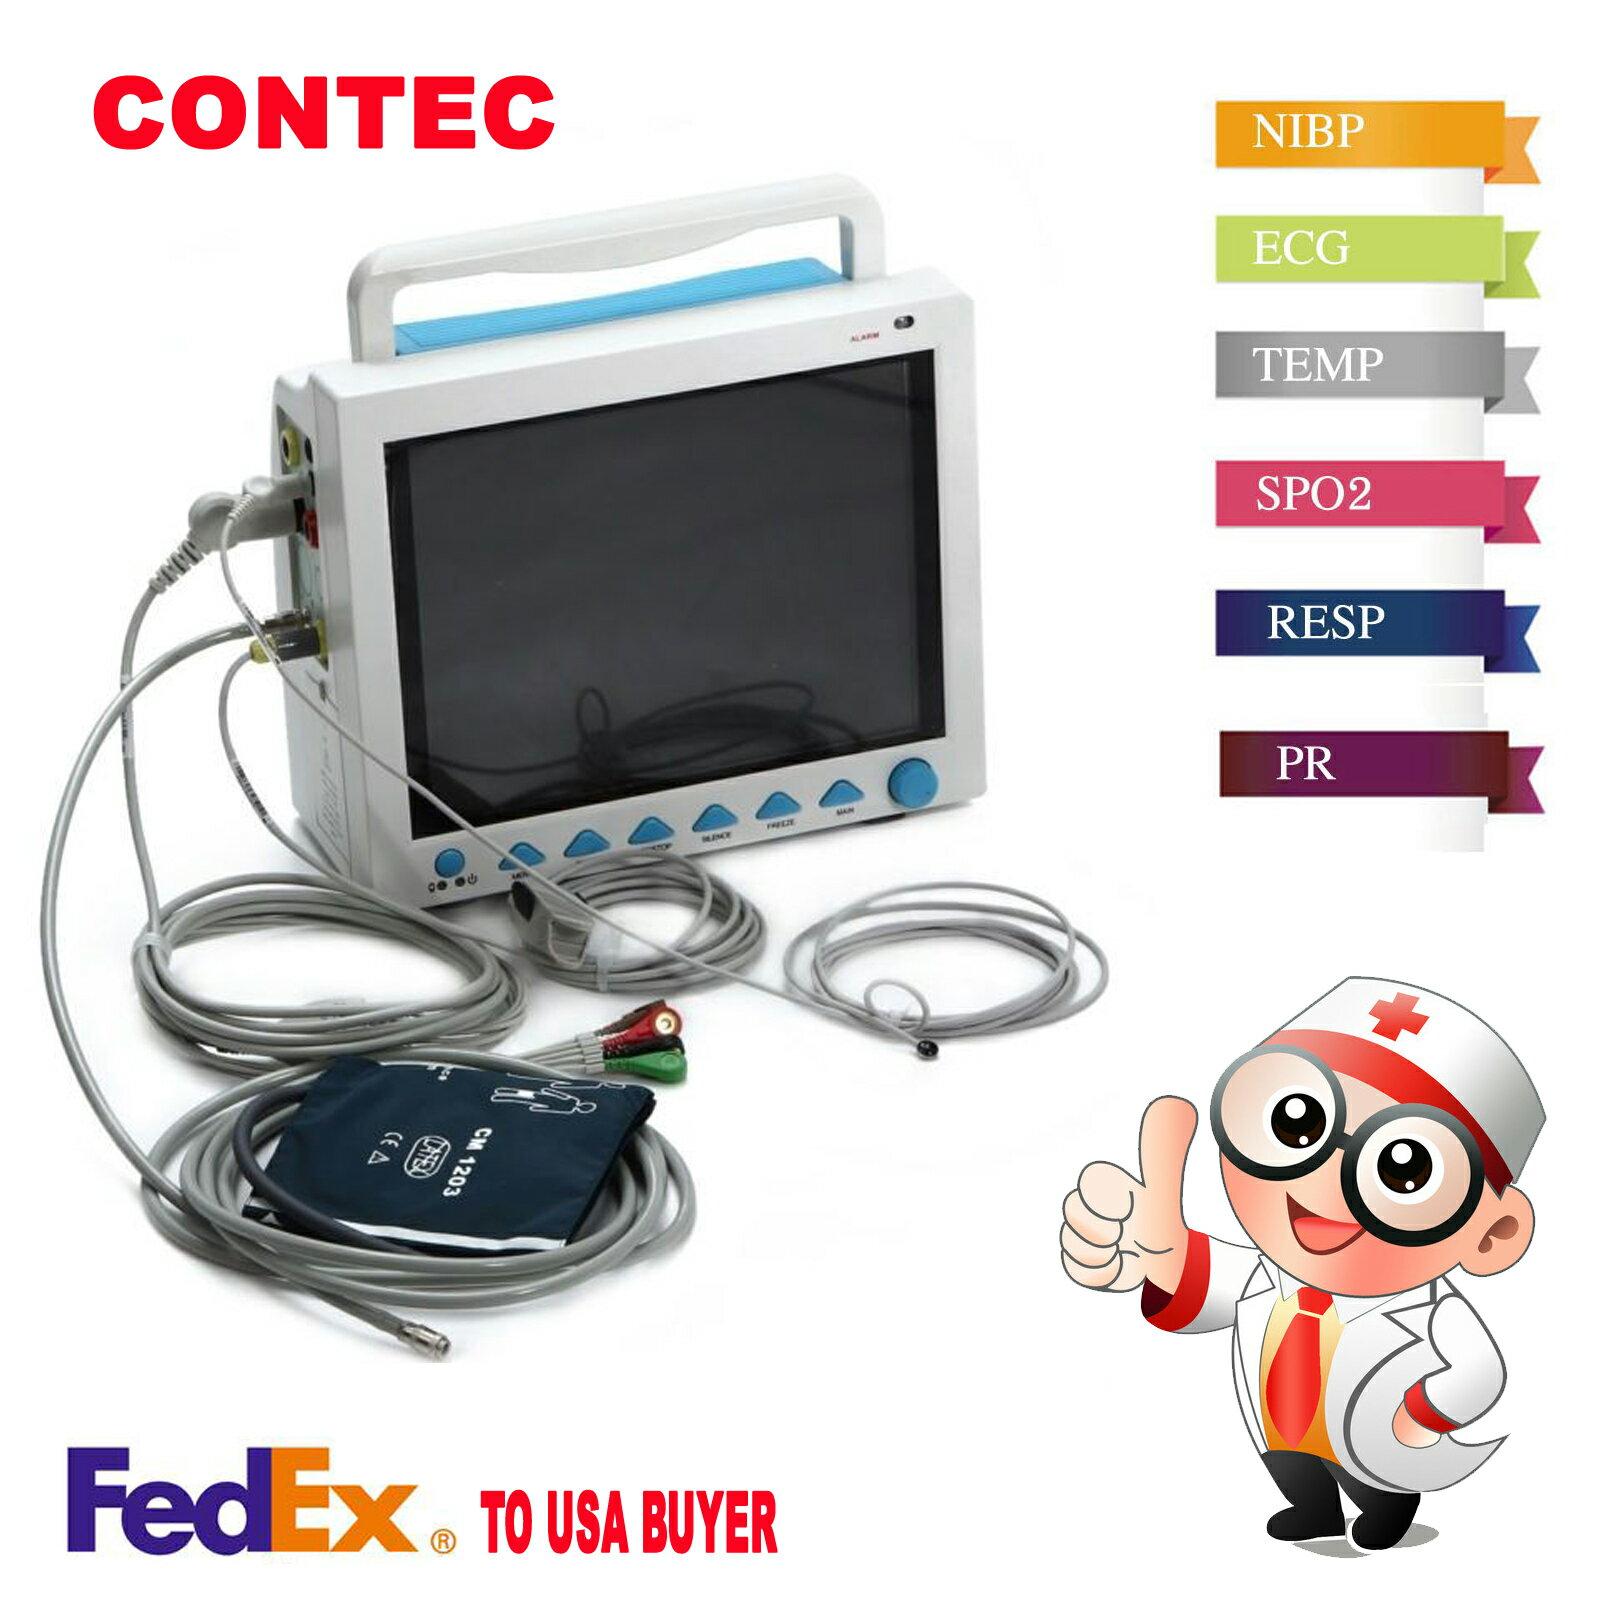 ICU CCU Portable Patient Monitor Vital Signs Multi parameter CONTEC CMS8000